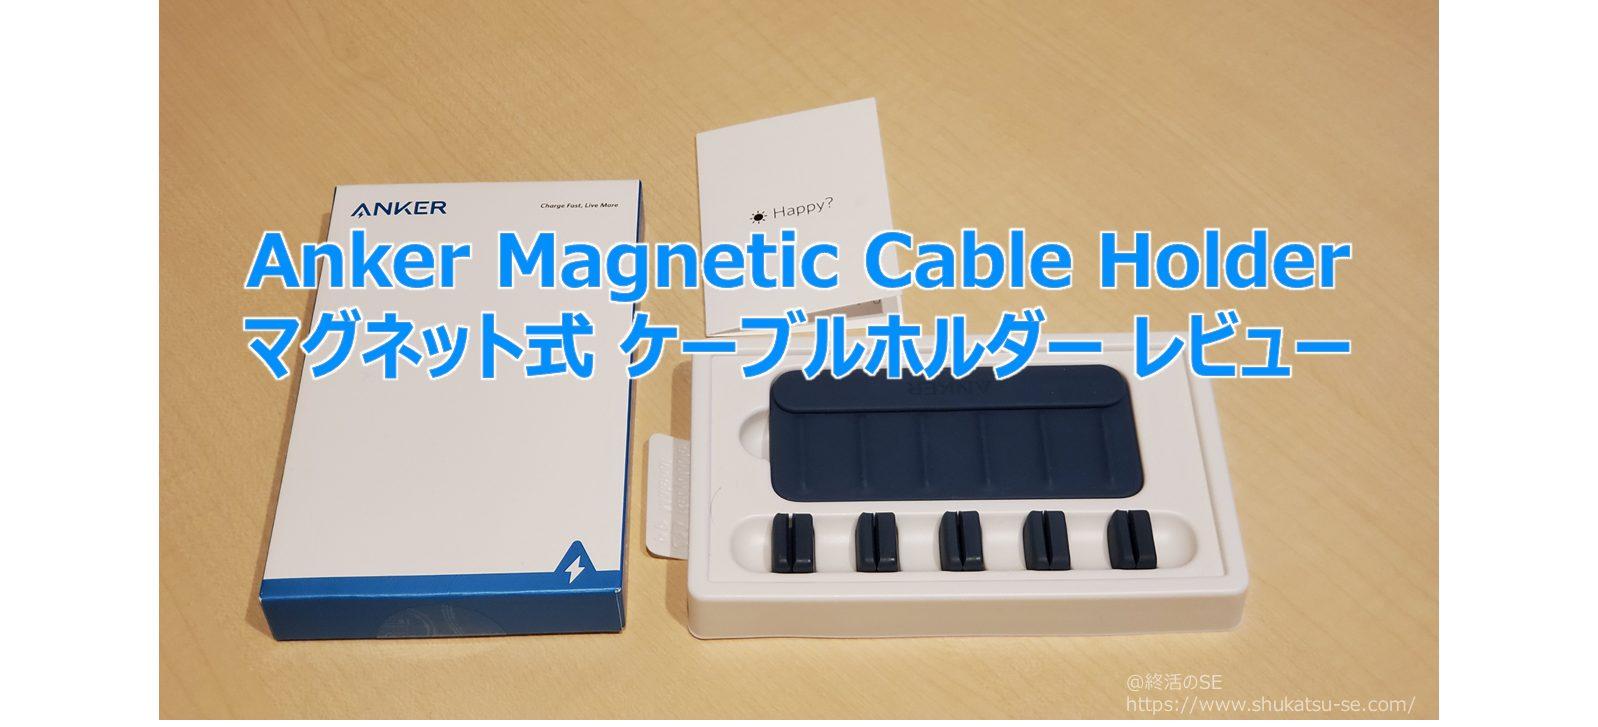 Anker Magnetic Cable Holder マグネット式 ケーブルホルダー レビュー